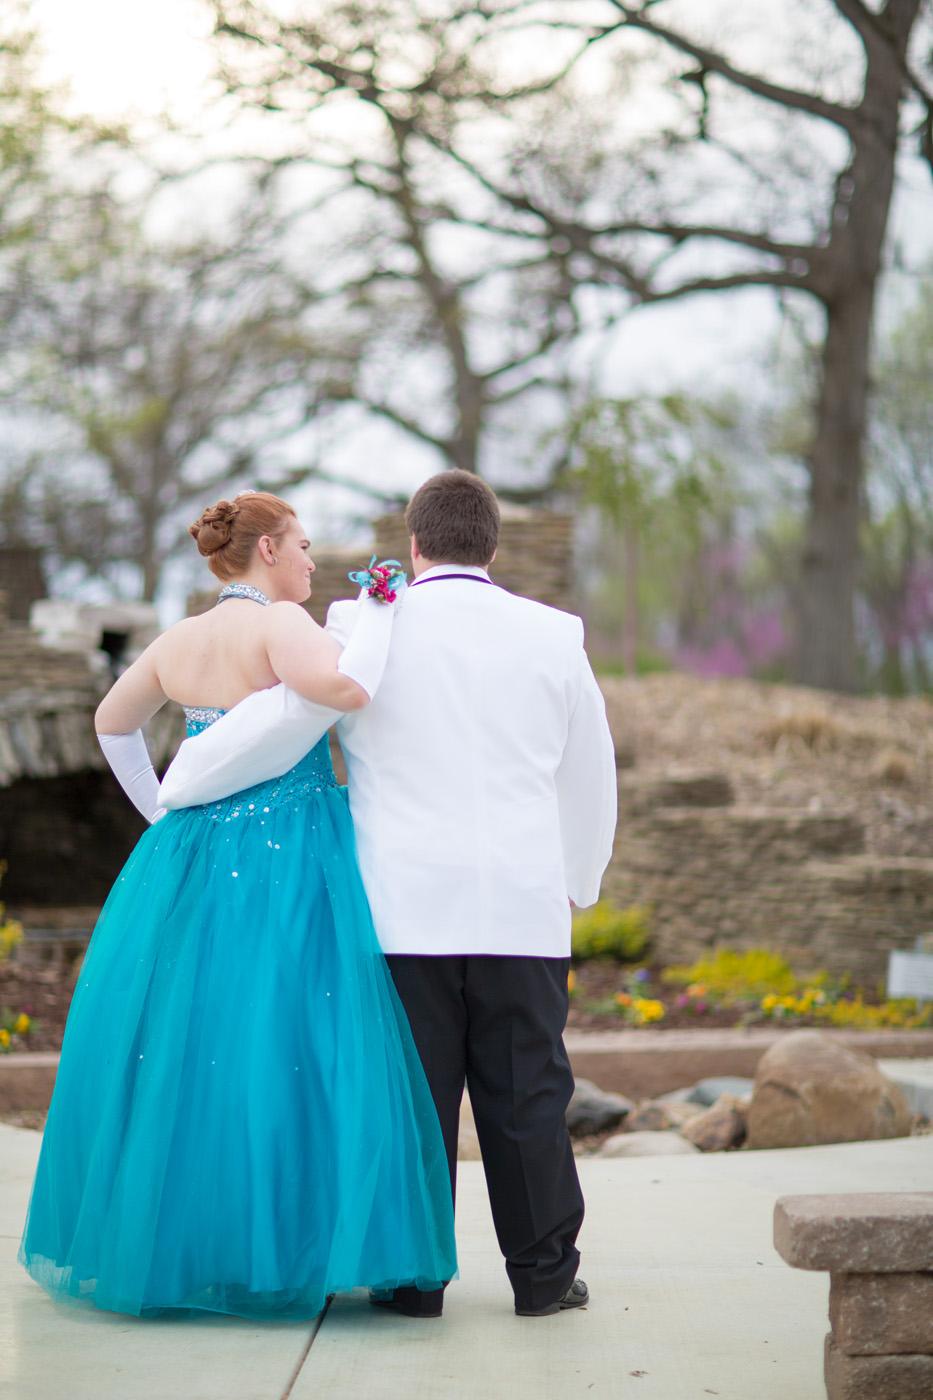 Garrett & Helen Prom 2014 235.jpg